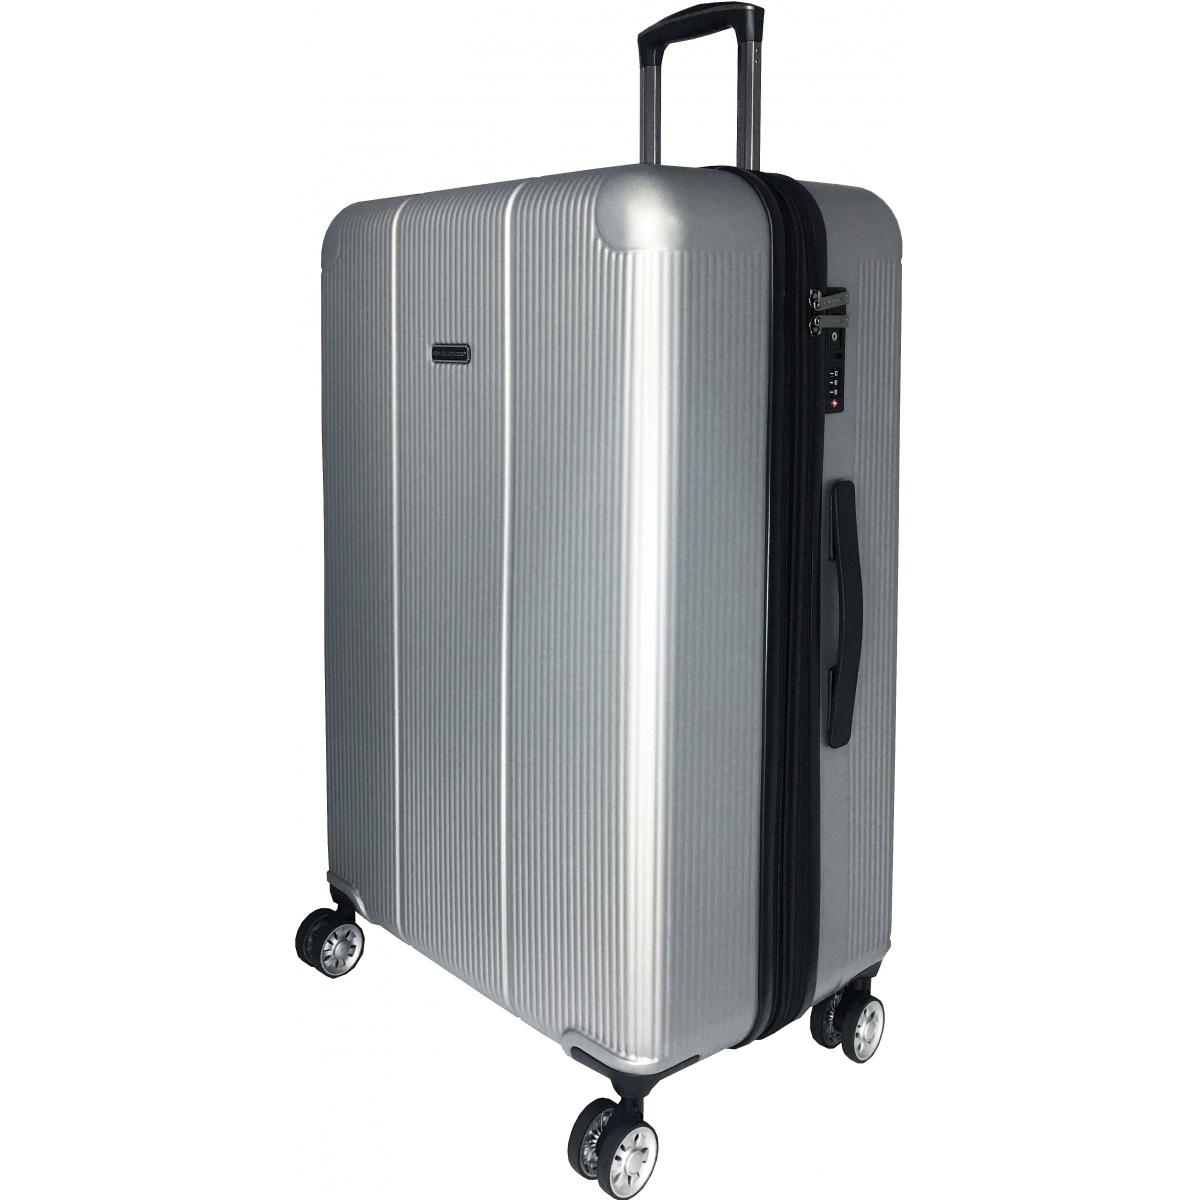 valise rigide david jones tsa abs 77 cm grande taille ba10251g gris couleur principale. Black Bedroom Furniture Sets. Home Design Ideas